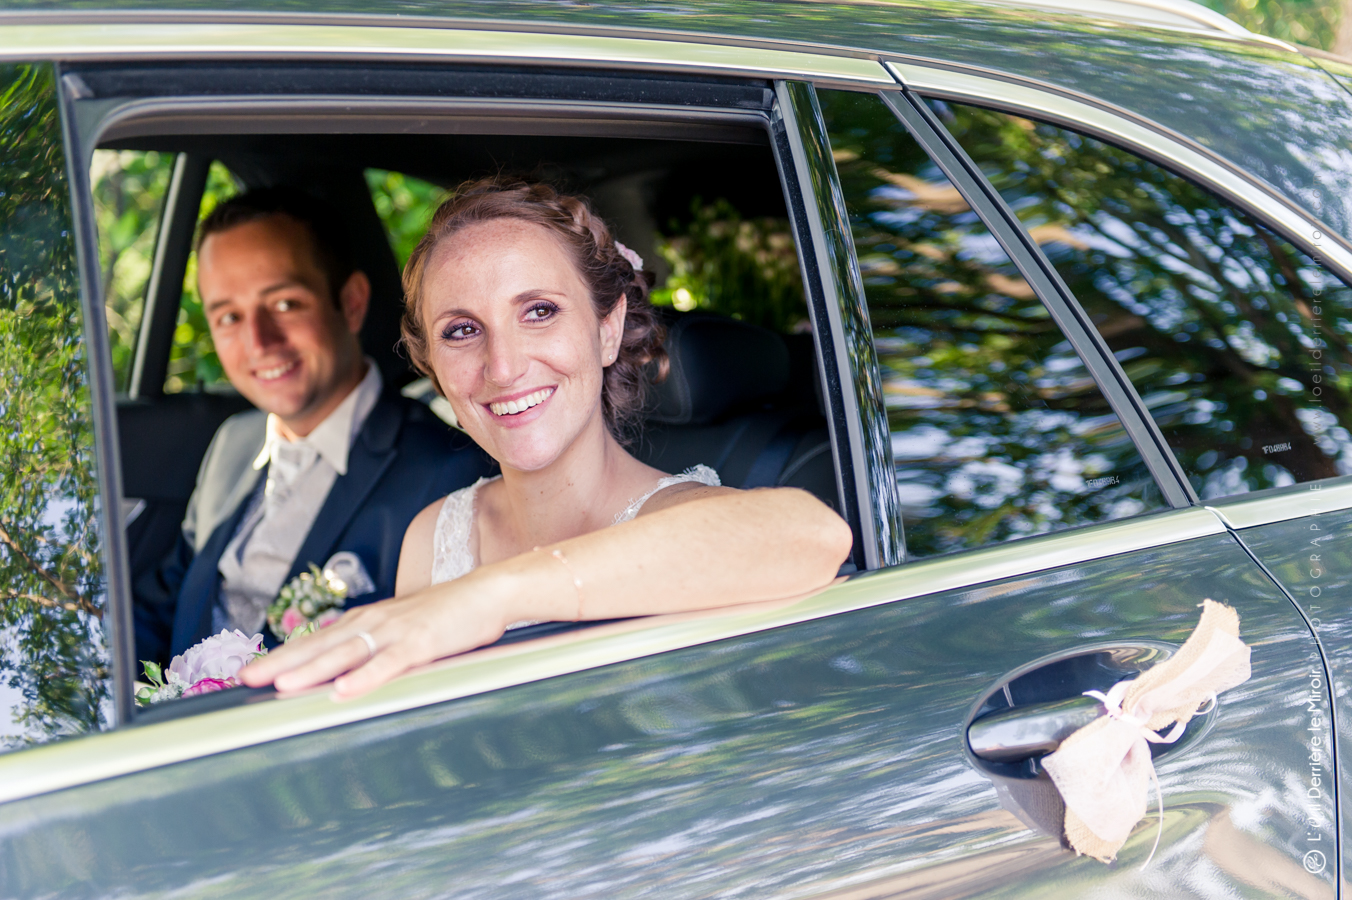 mariage-cj-vaugrenier-loeilderrierelemiroir-048